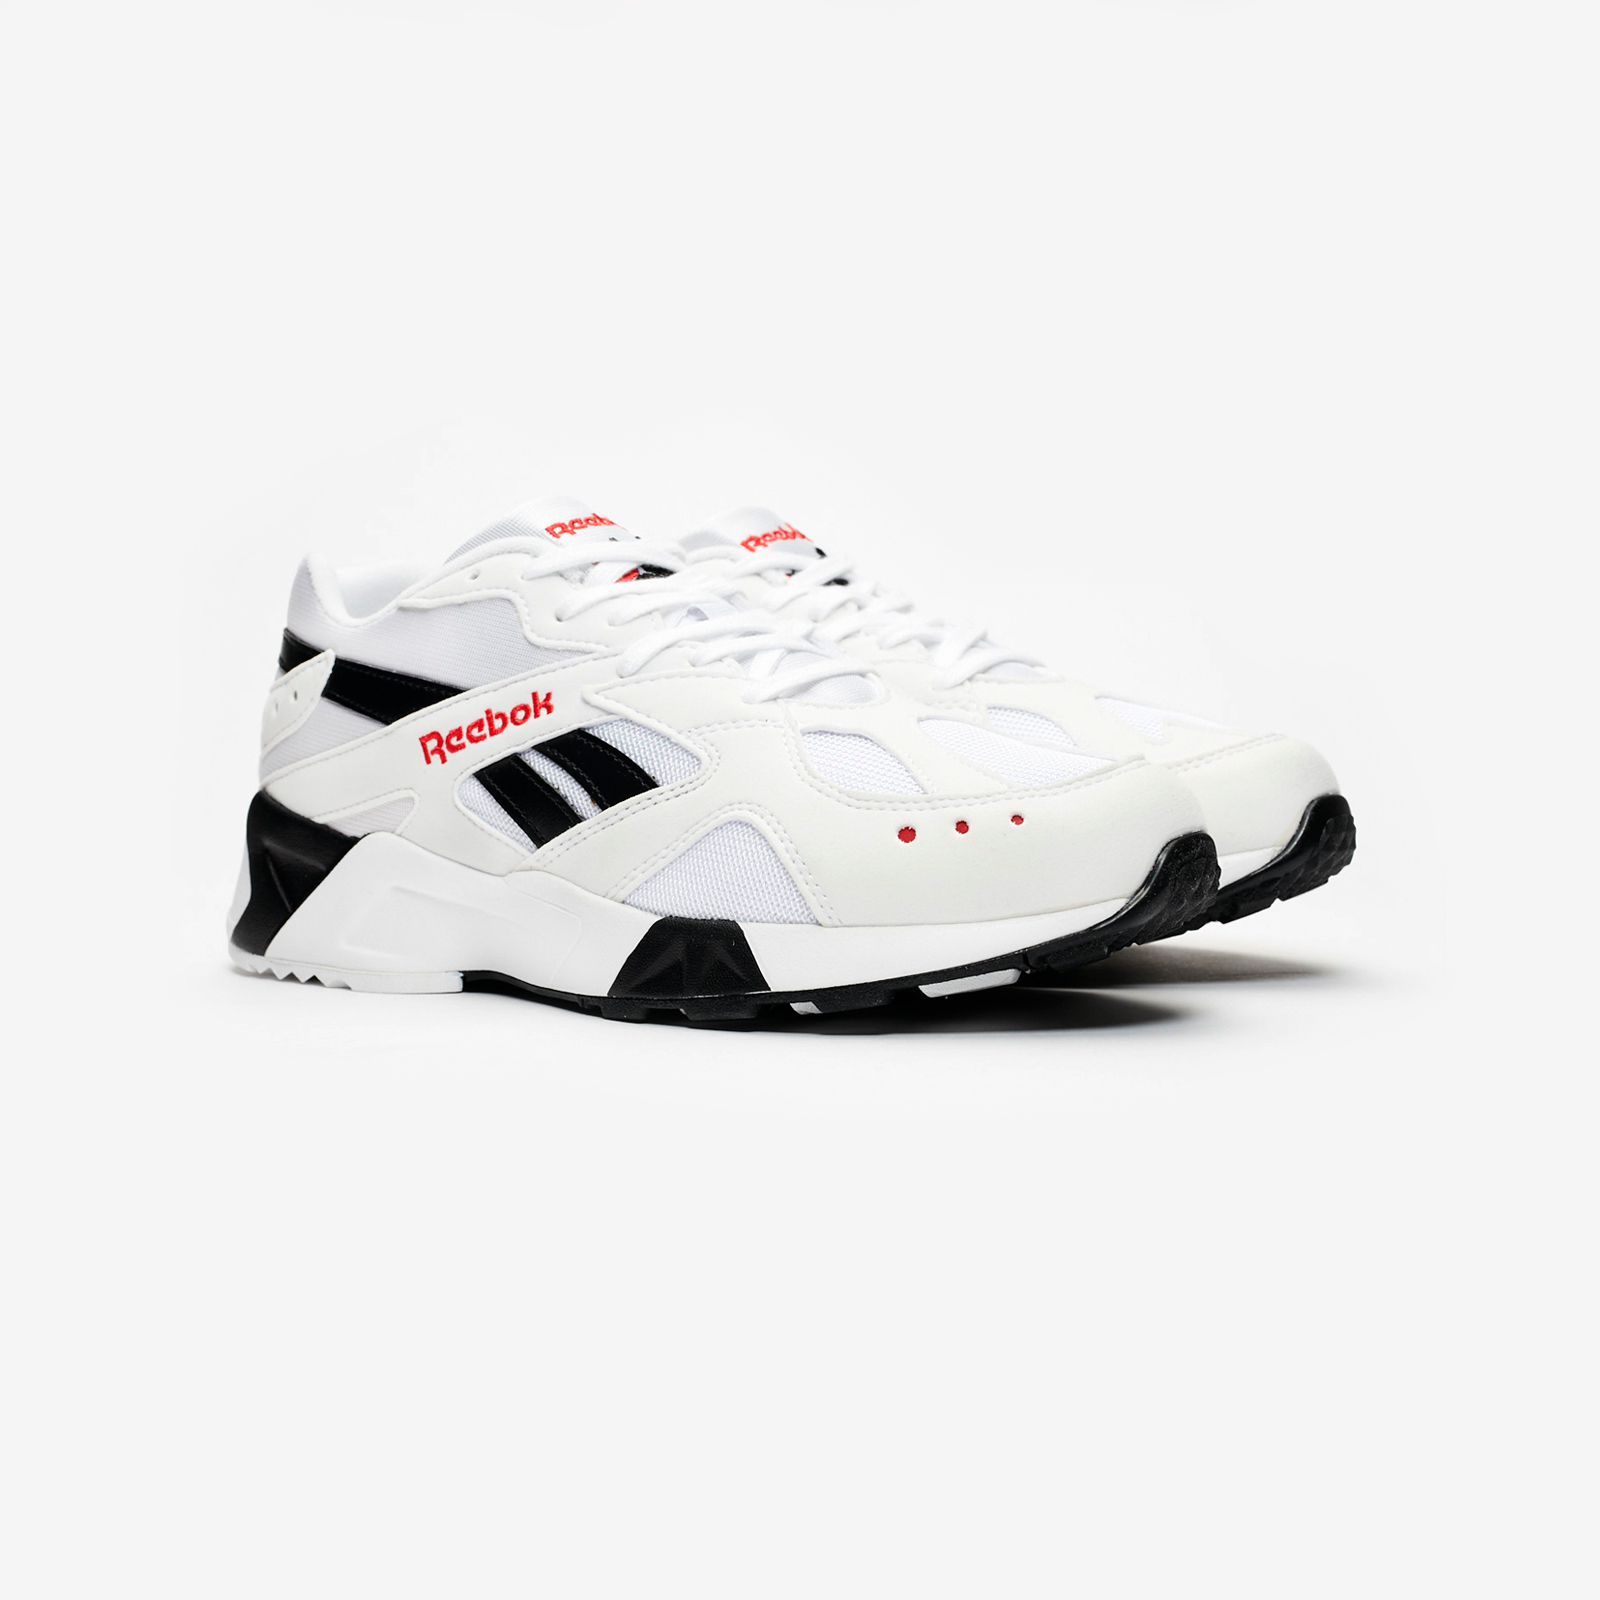 Reebok Aztrek - Cn7187 - Sneakersnstuff  220e615f3